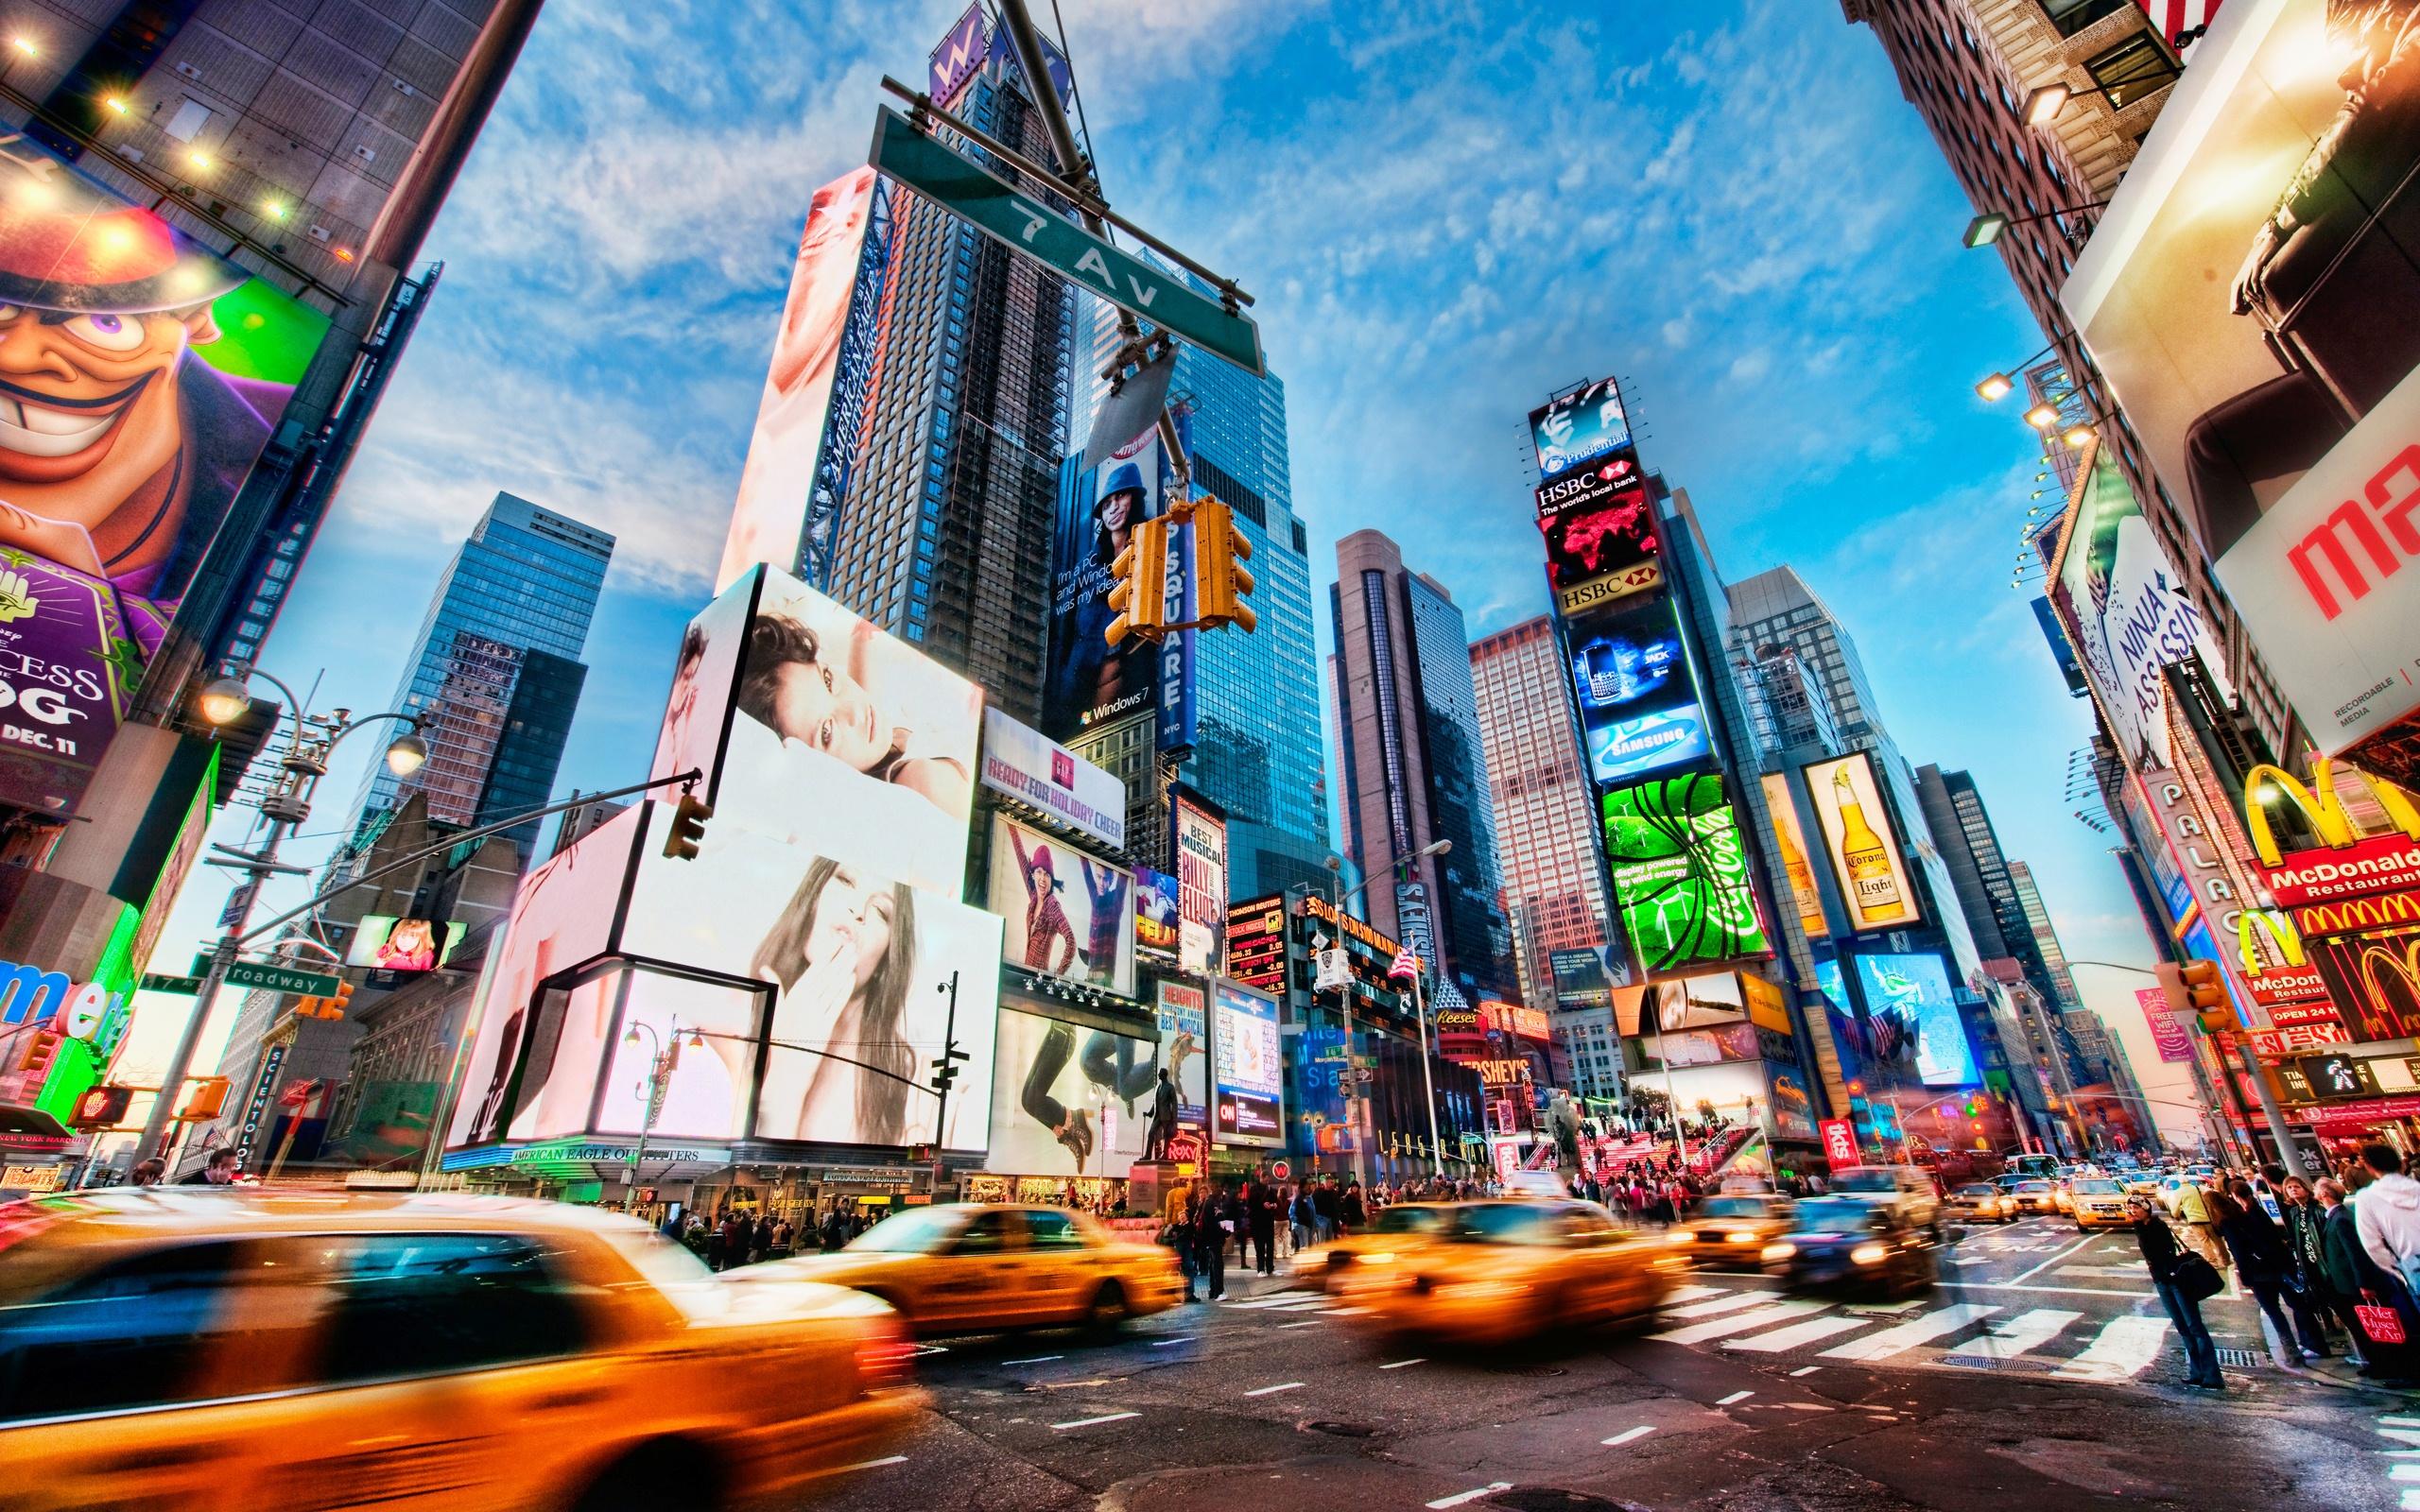 New york city wallpaper 18011 2560x1600 px hdwallsource new york city wallpaper 18011 voltagebd Image collections